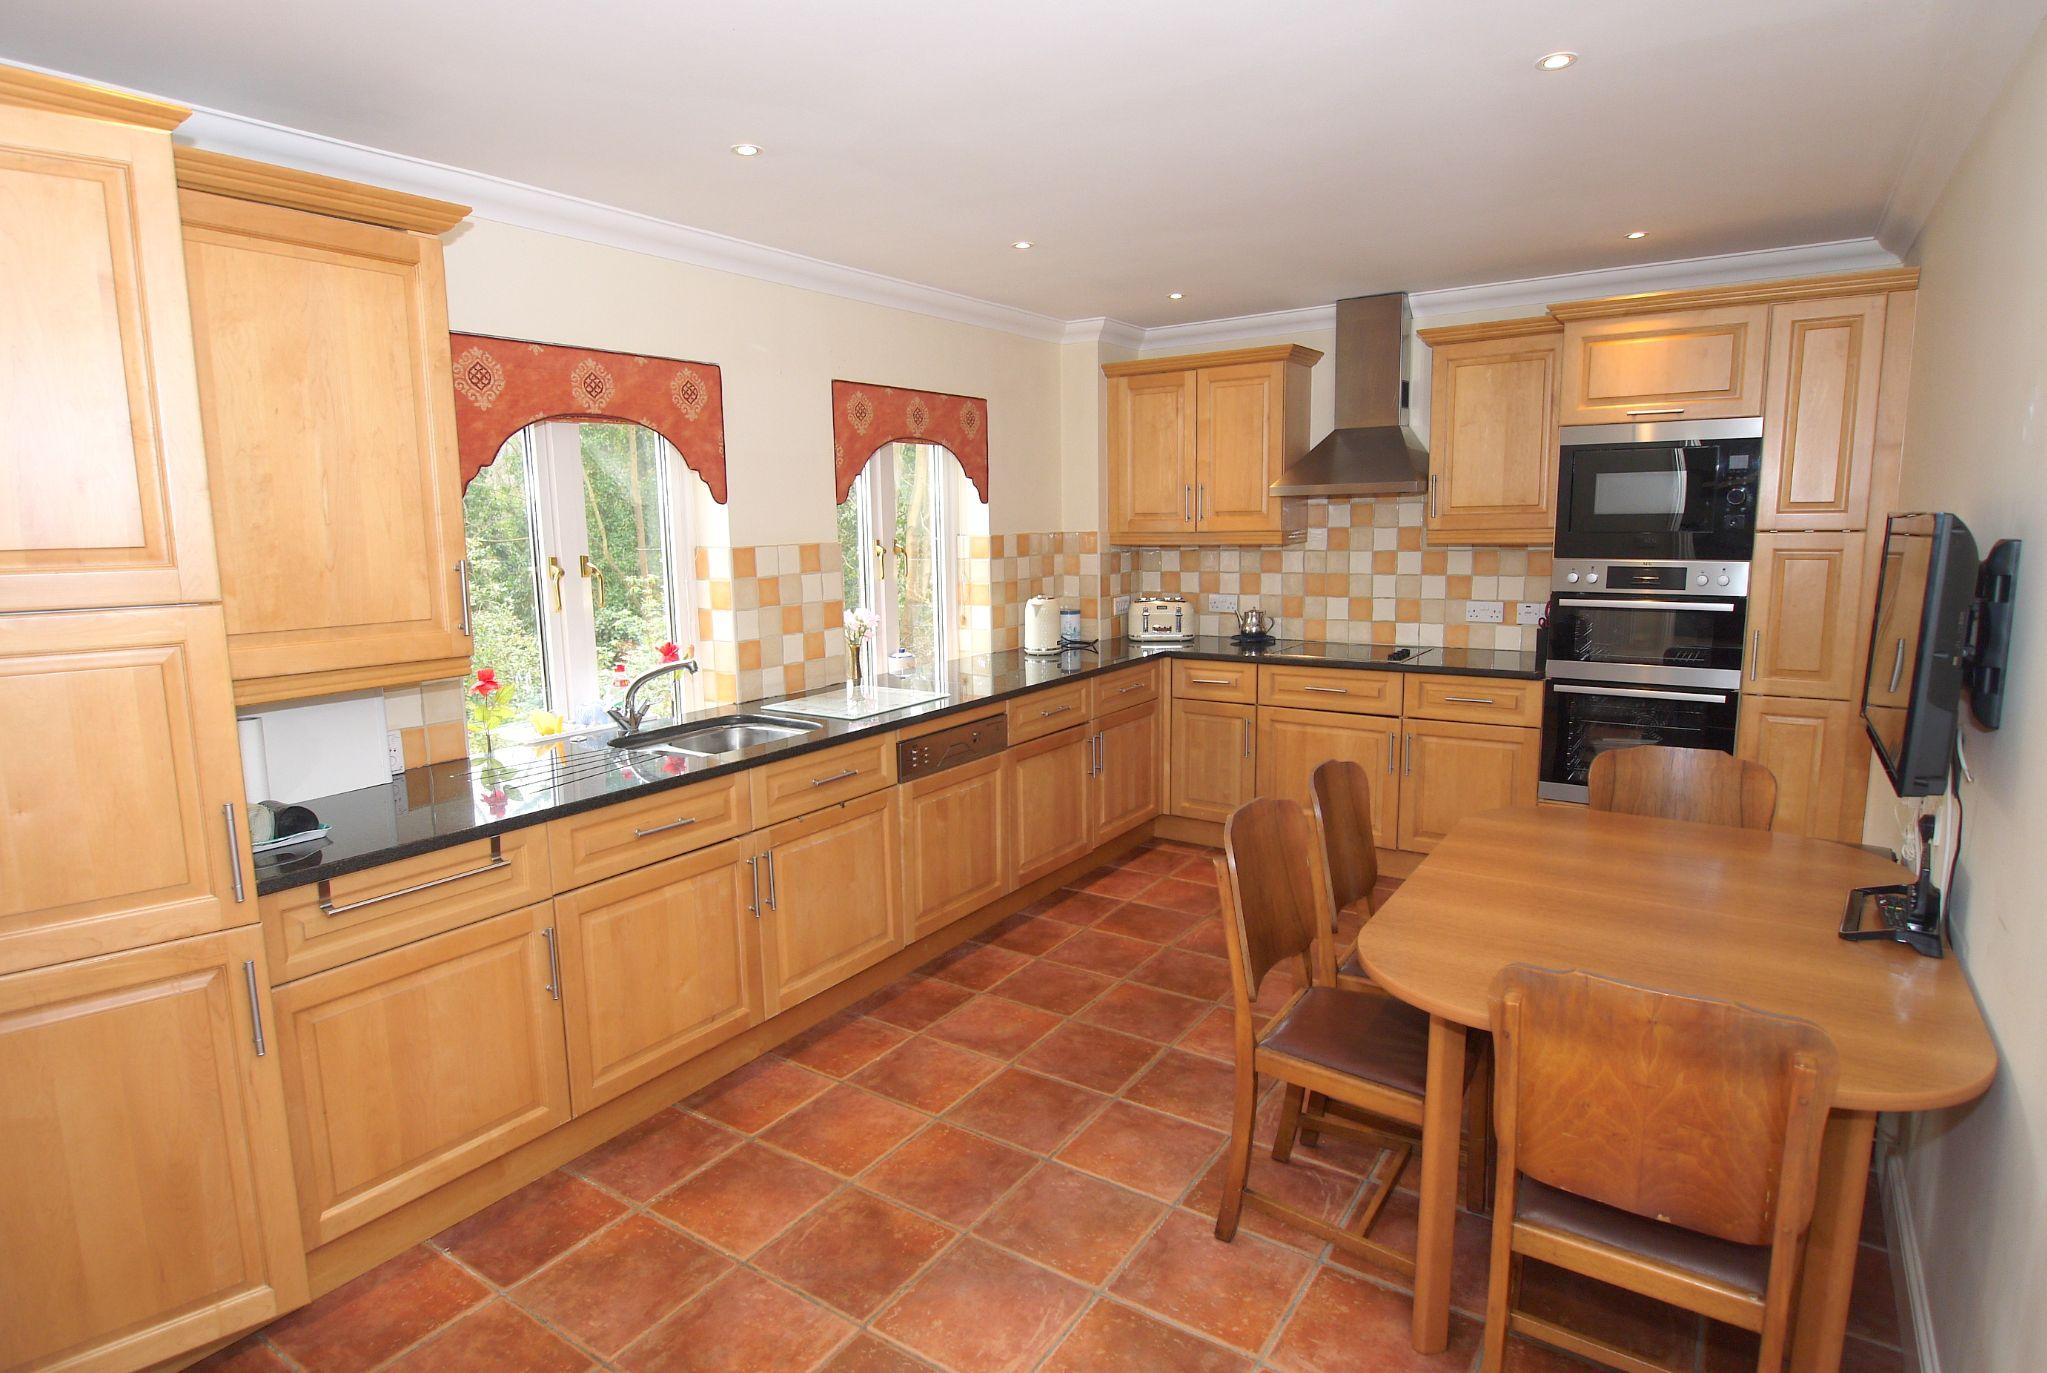 2 bedroom ground floor For Sale in Sevenoaks - Photograph 7